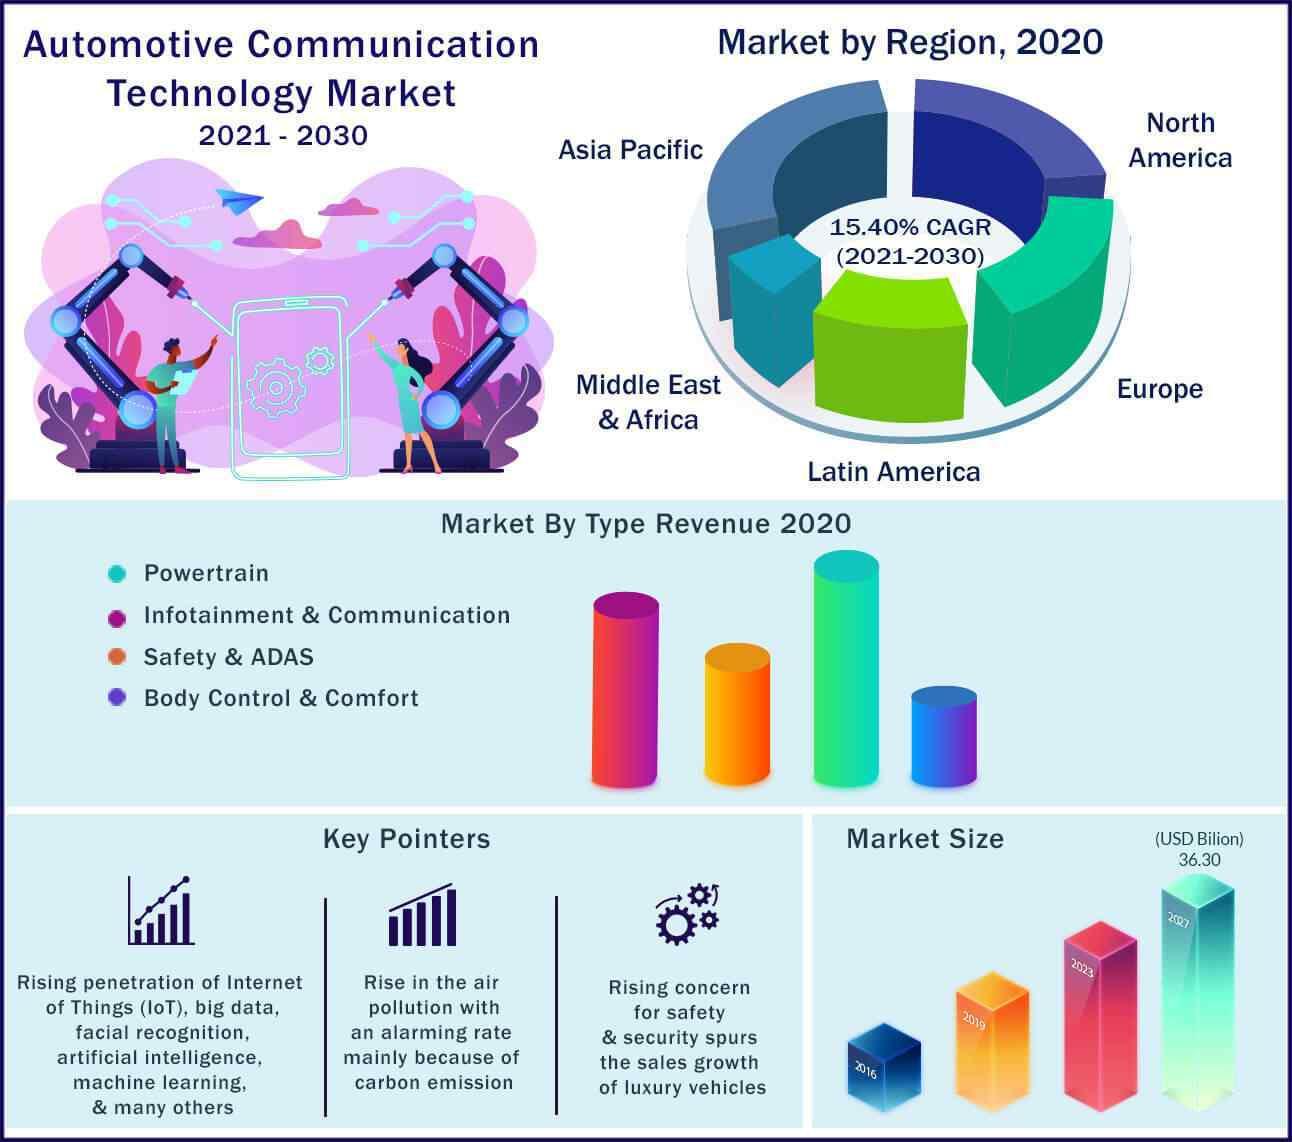 Global Automotive Communication Technology Market 2021-2030